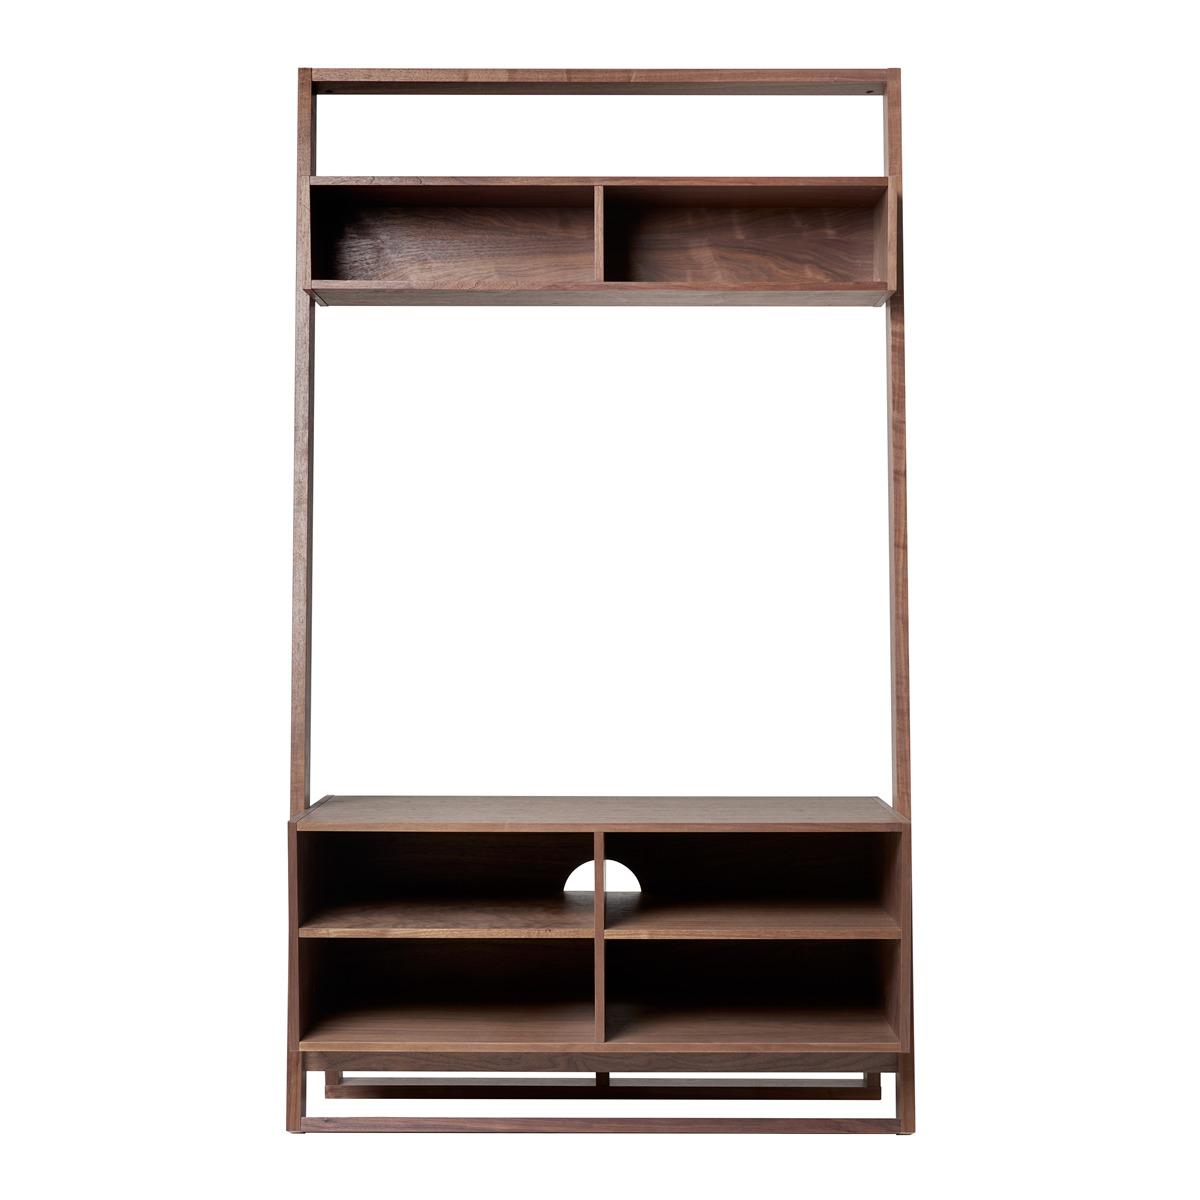 Catalogo de muebles del corte ingles idea creativa della for Catalogo de muebles